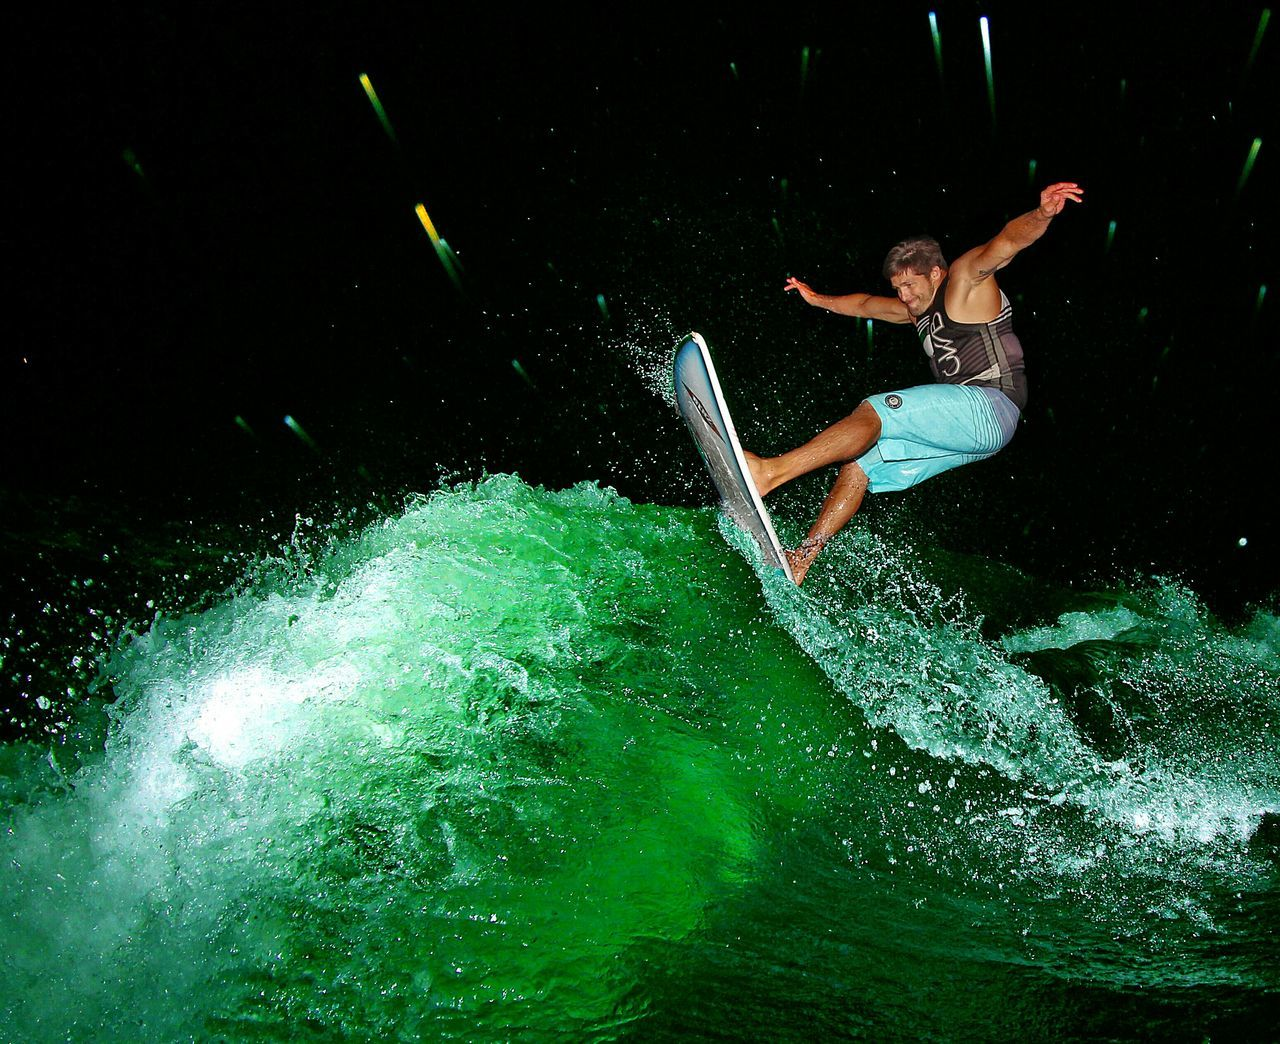 Surf's Up in Manson, WA. Adventure Club Adrenaline Junkie Surfer Glitch Capture The Moment Wakesurfing Surfing Capturing Movement The Adventure Handbook Pacific Northwest  Alternative Fitness